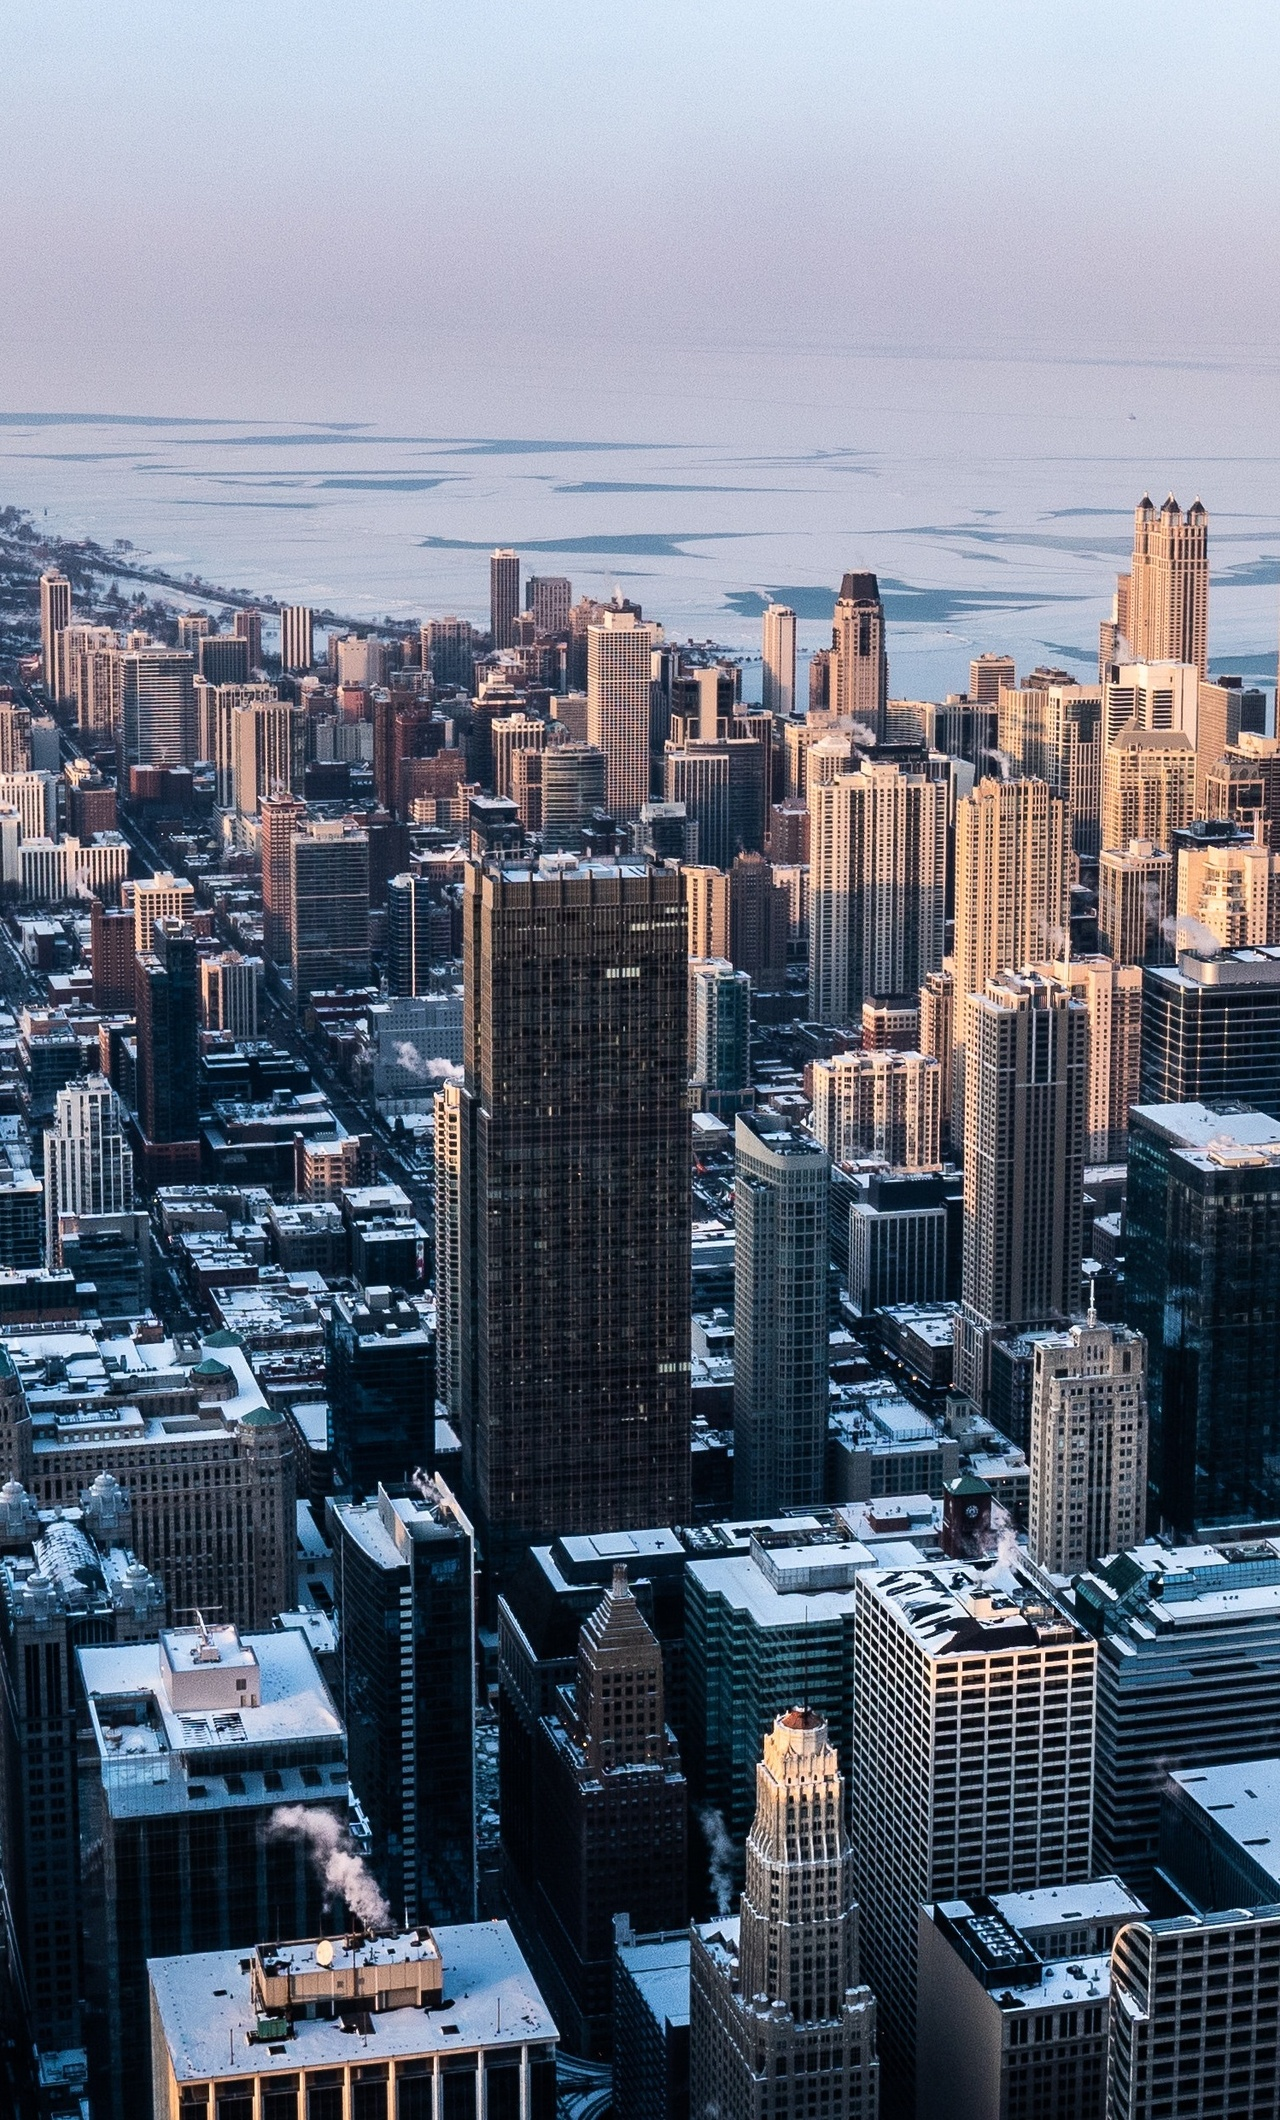 1280x2120 Chicago United States 5k Iphone 6 Hd 4k